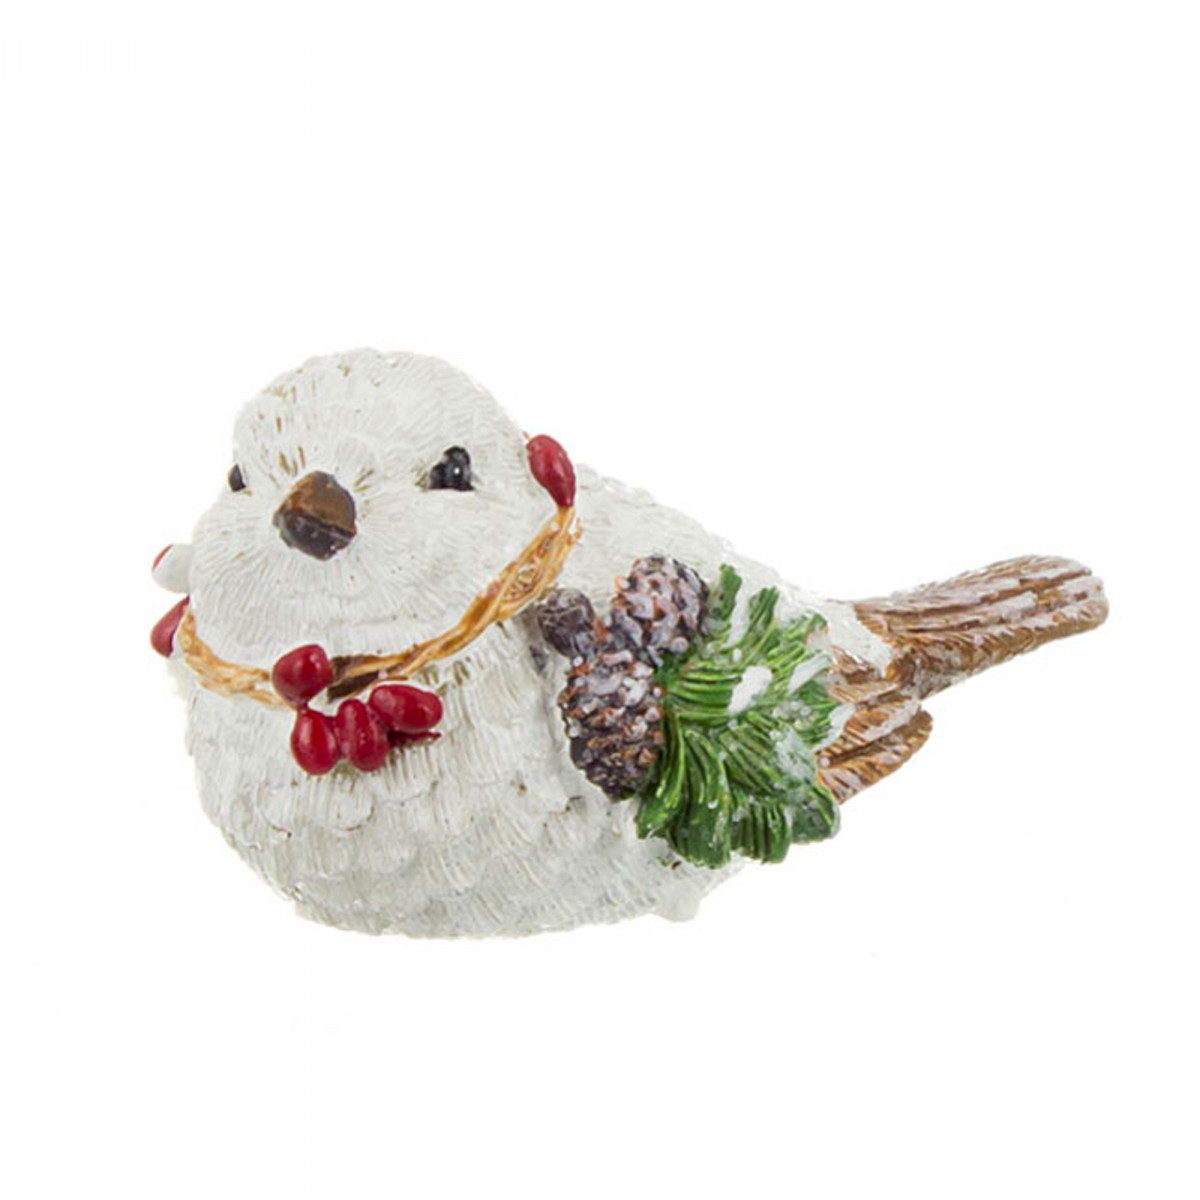 {} Lefard Интерьерная игрушка Jaimee  (5х5х8 см) lefard сувенир murty 5х5х8 см